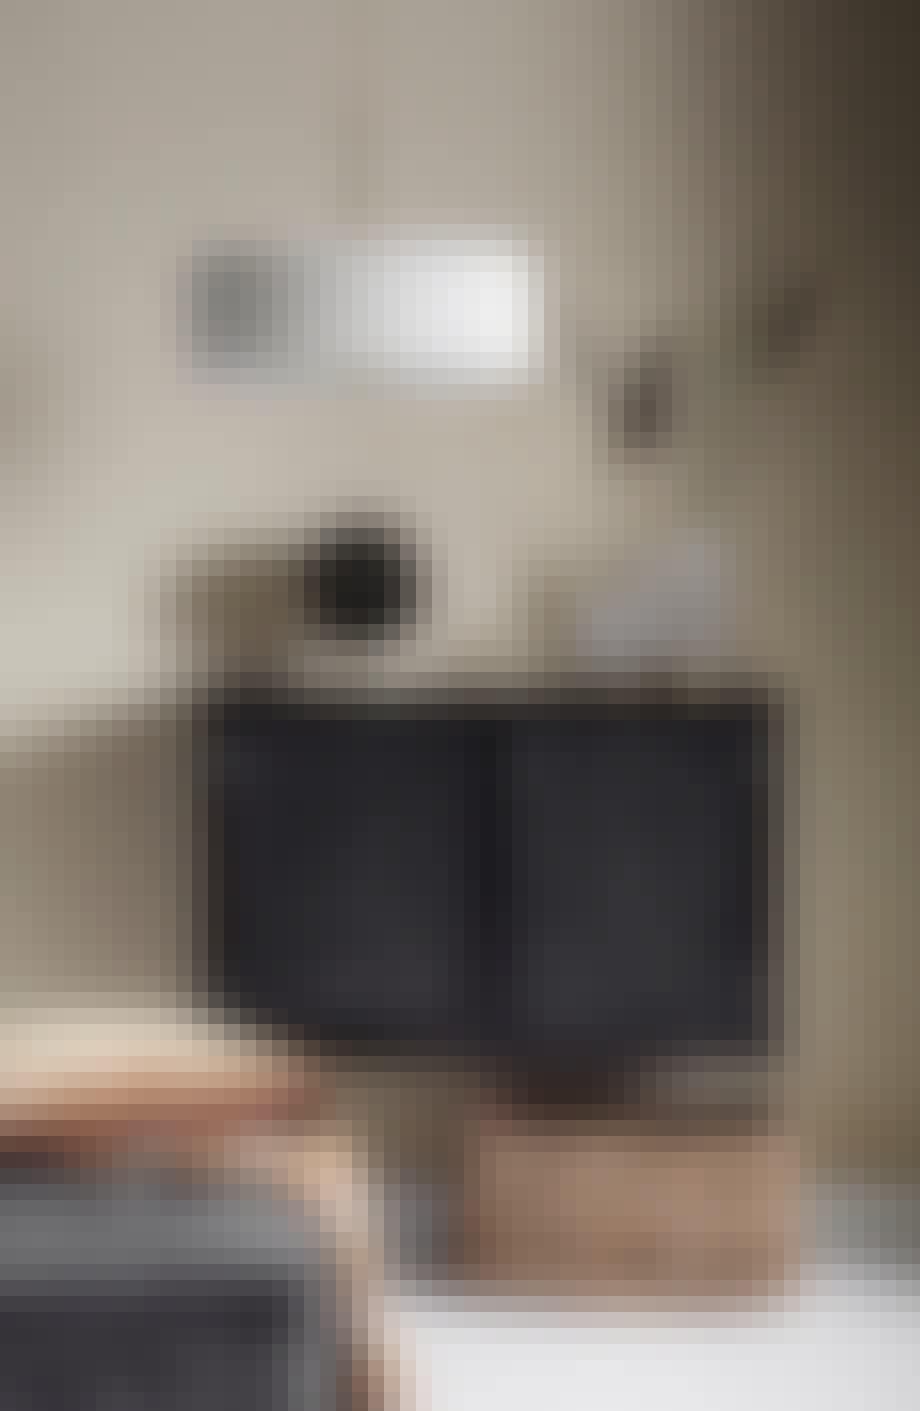 Loftlampe med plissé skærm